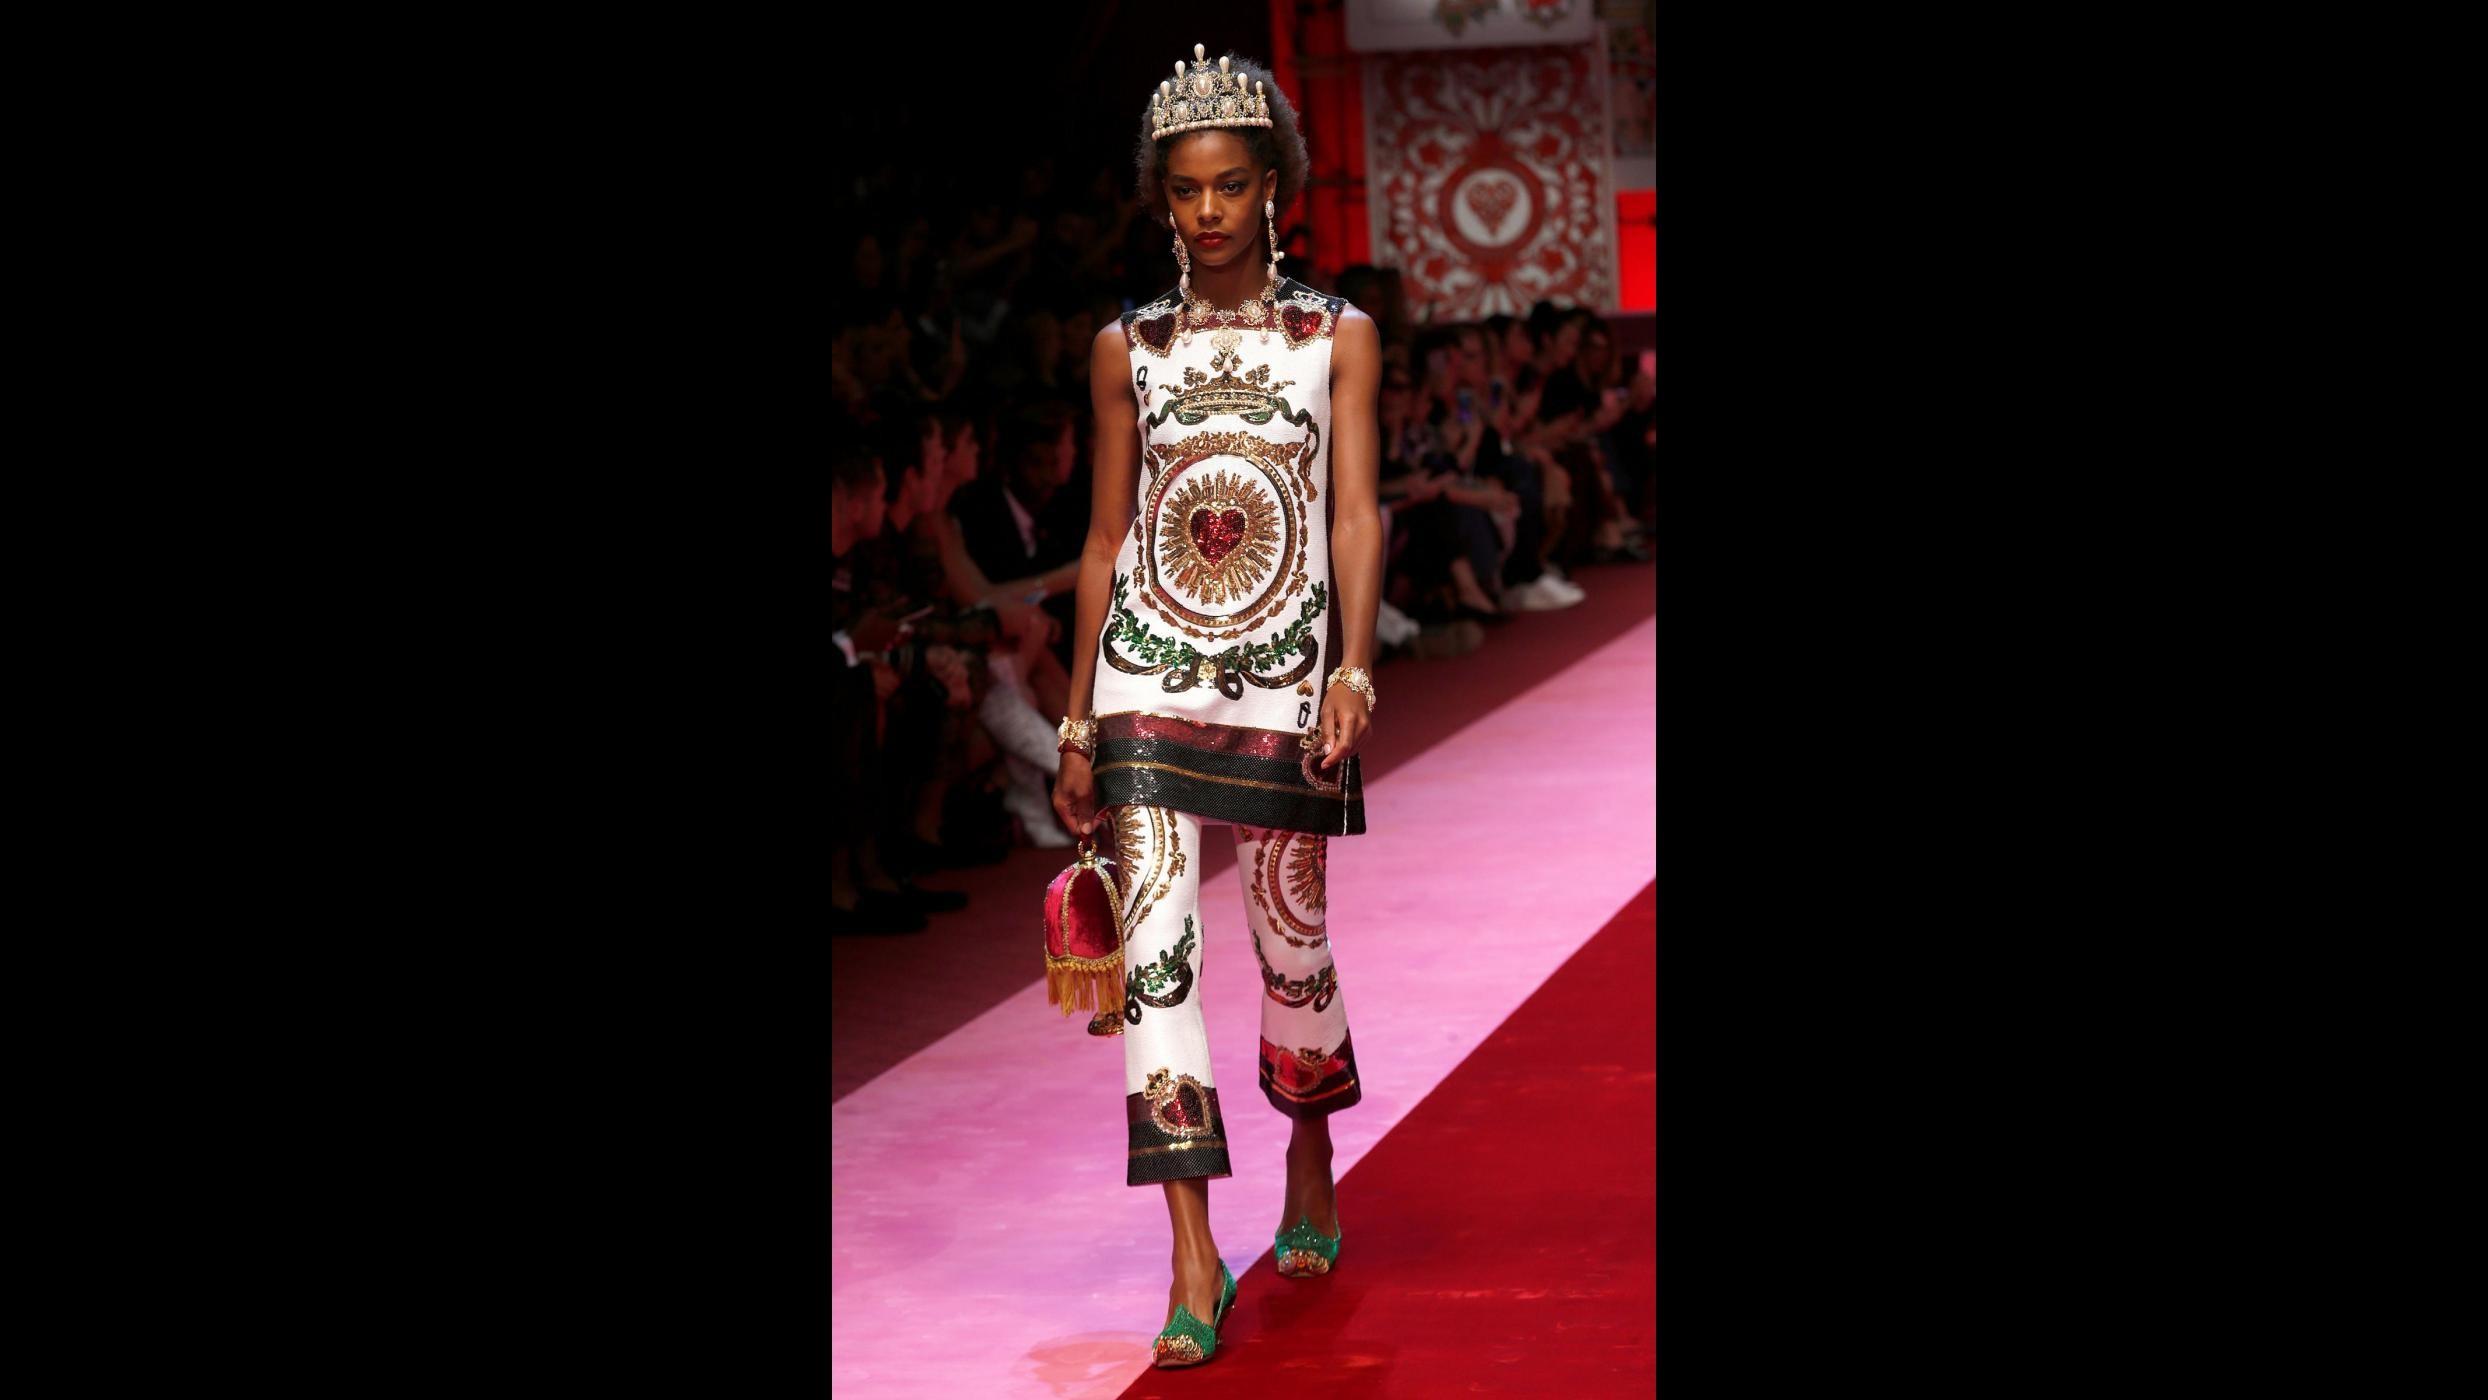 Una regina di cuori in passerella: la donna Dolce&Gabbana